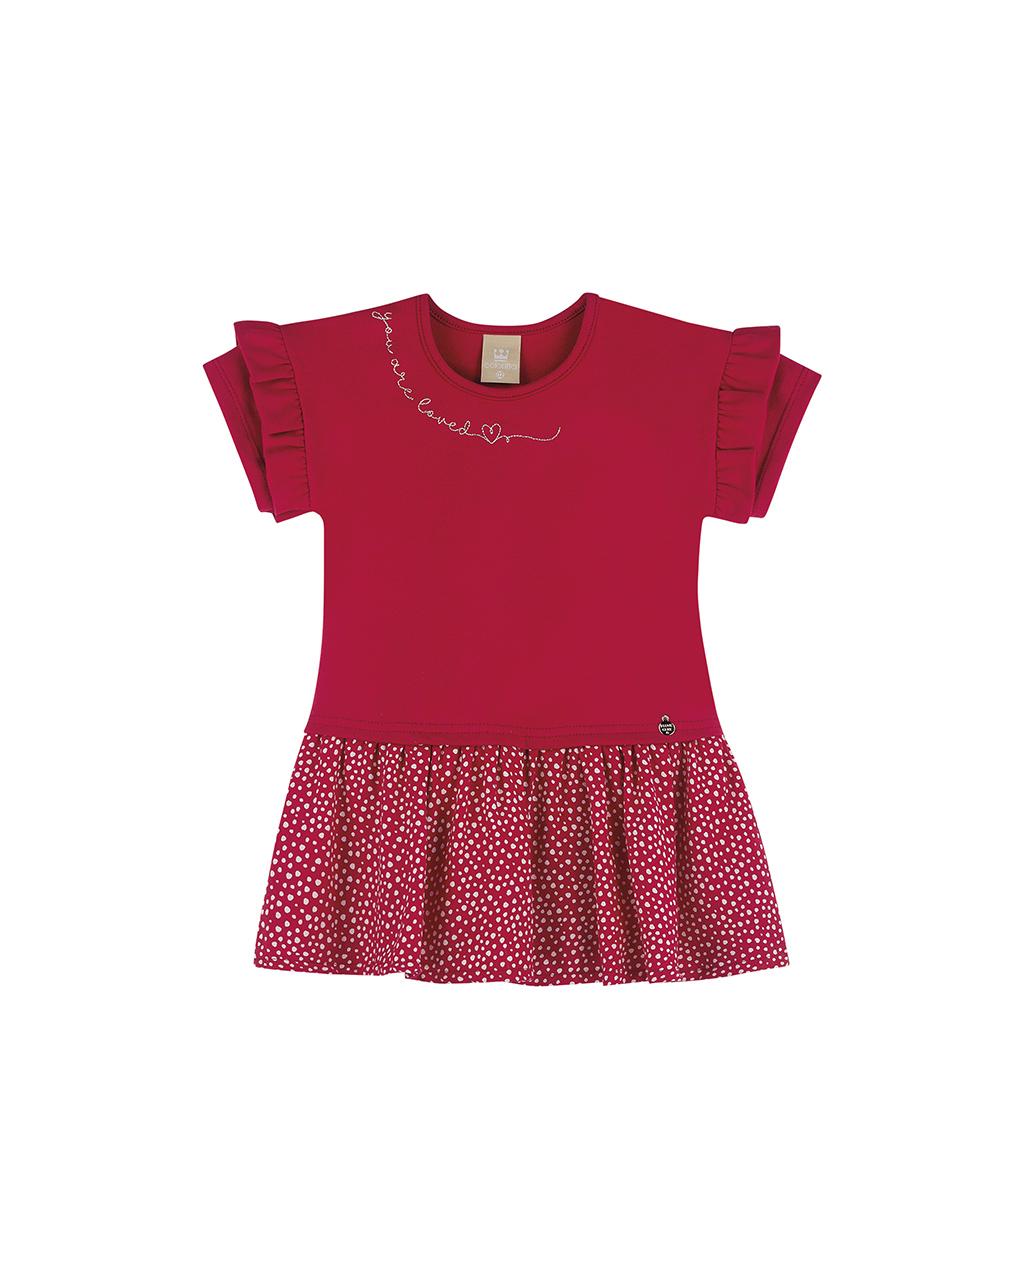 Vestido Infantil Poa Vermelho Coloritta